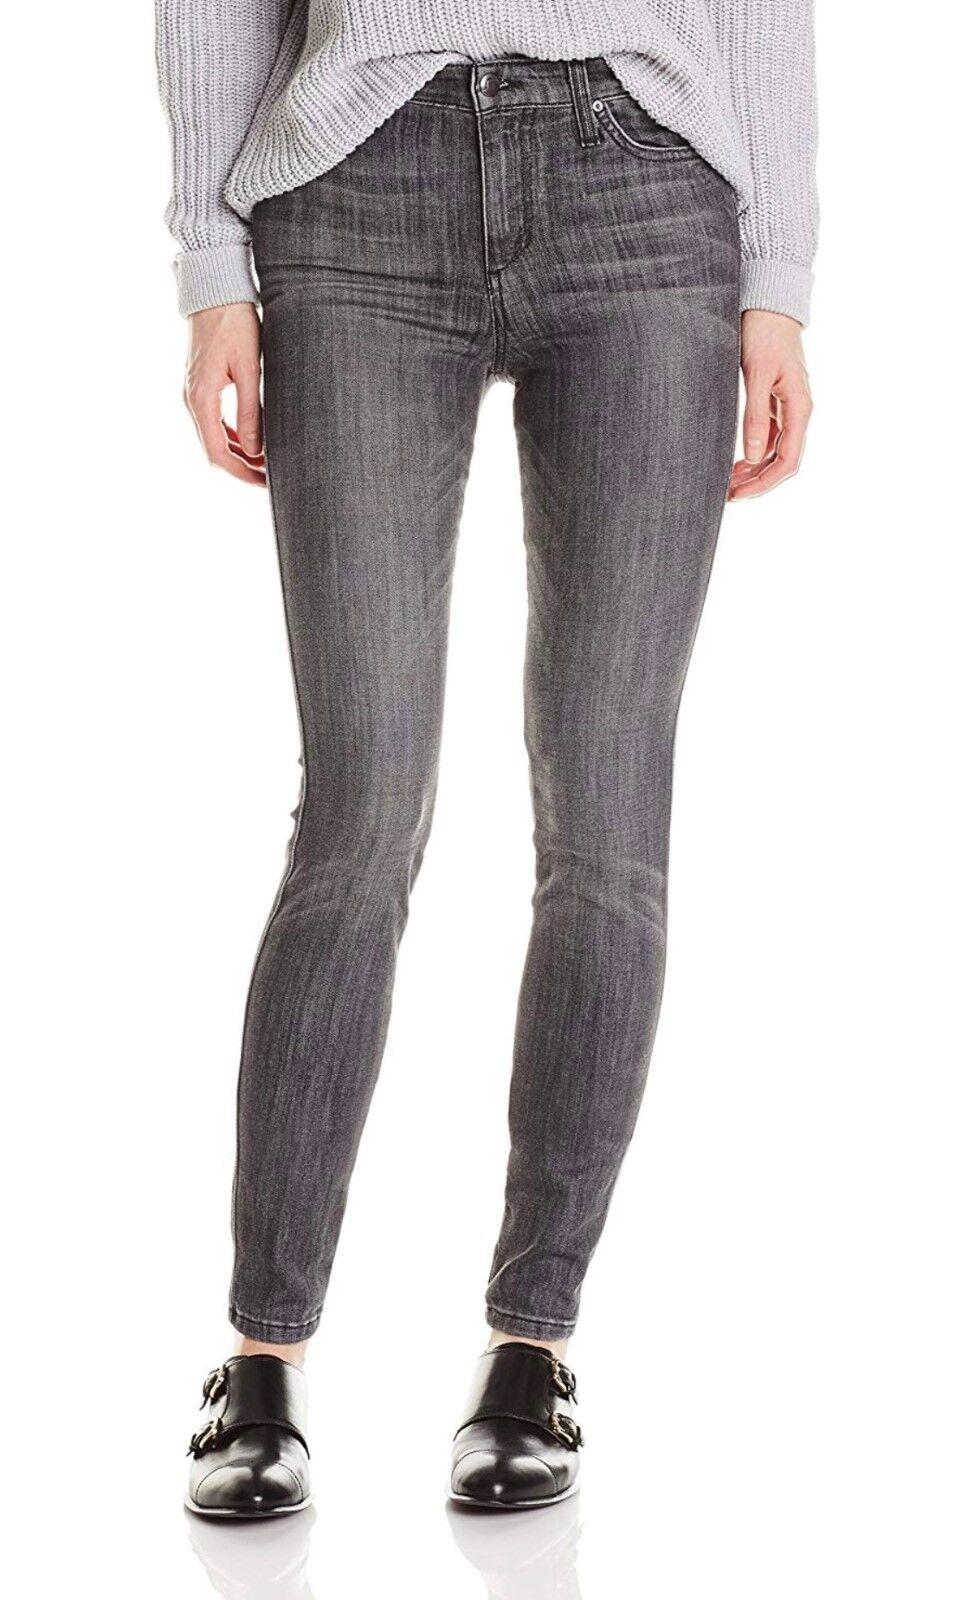 NWT Joe's Jeans Women's High-Rise Fahrenheit Skinny Jean size 26